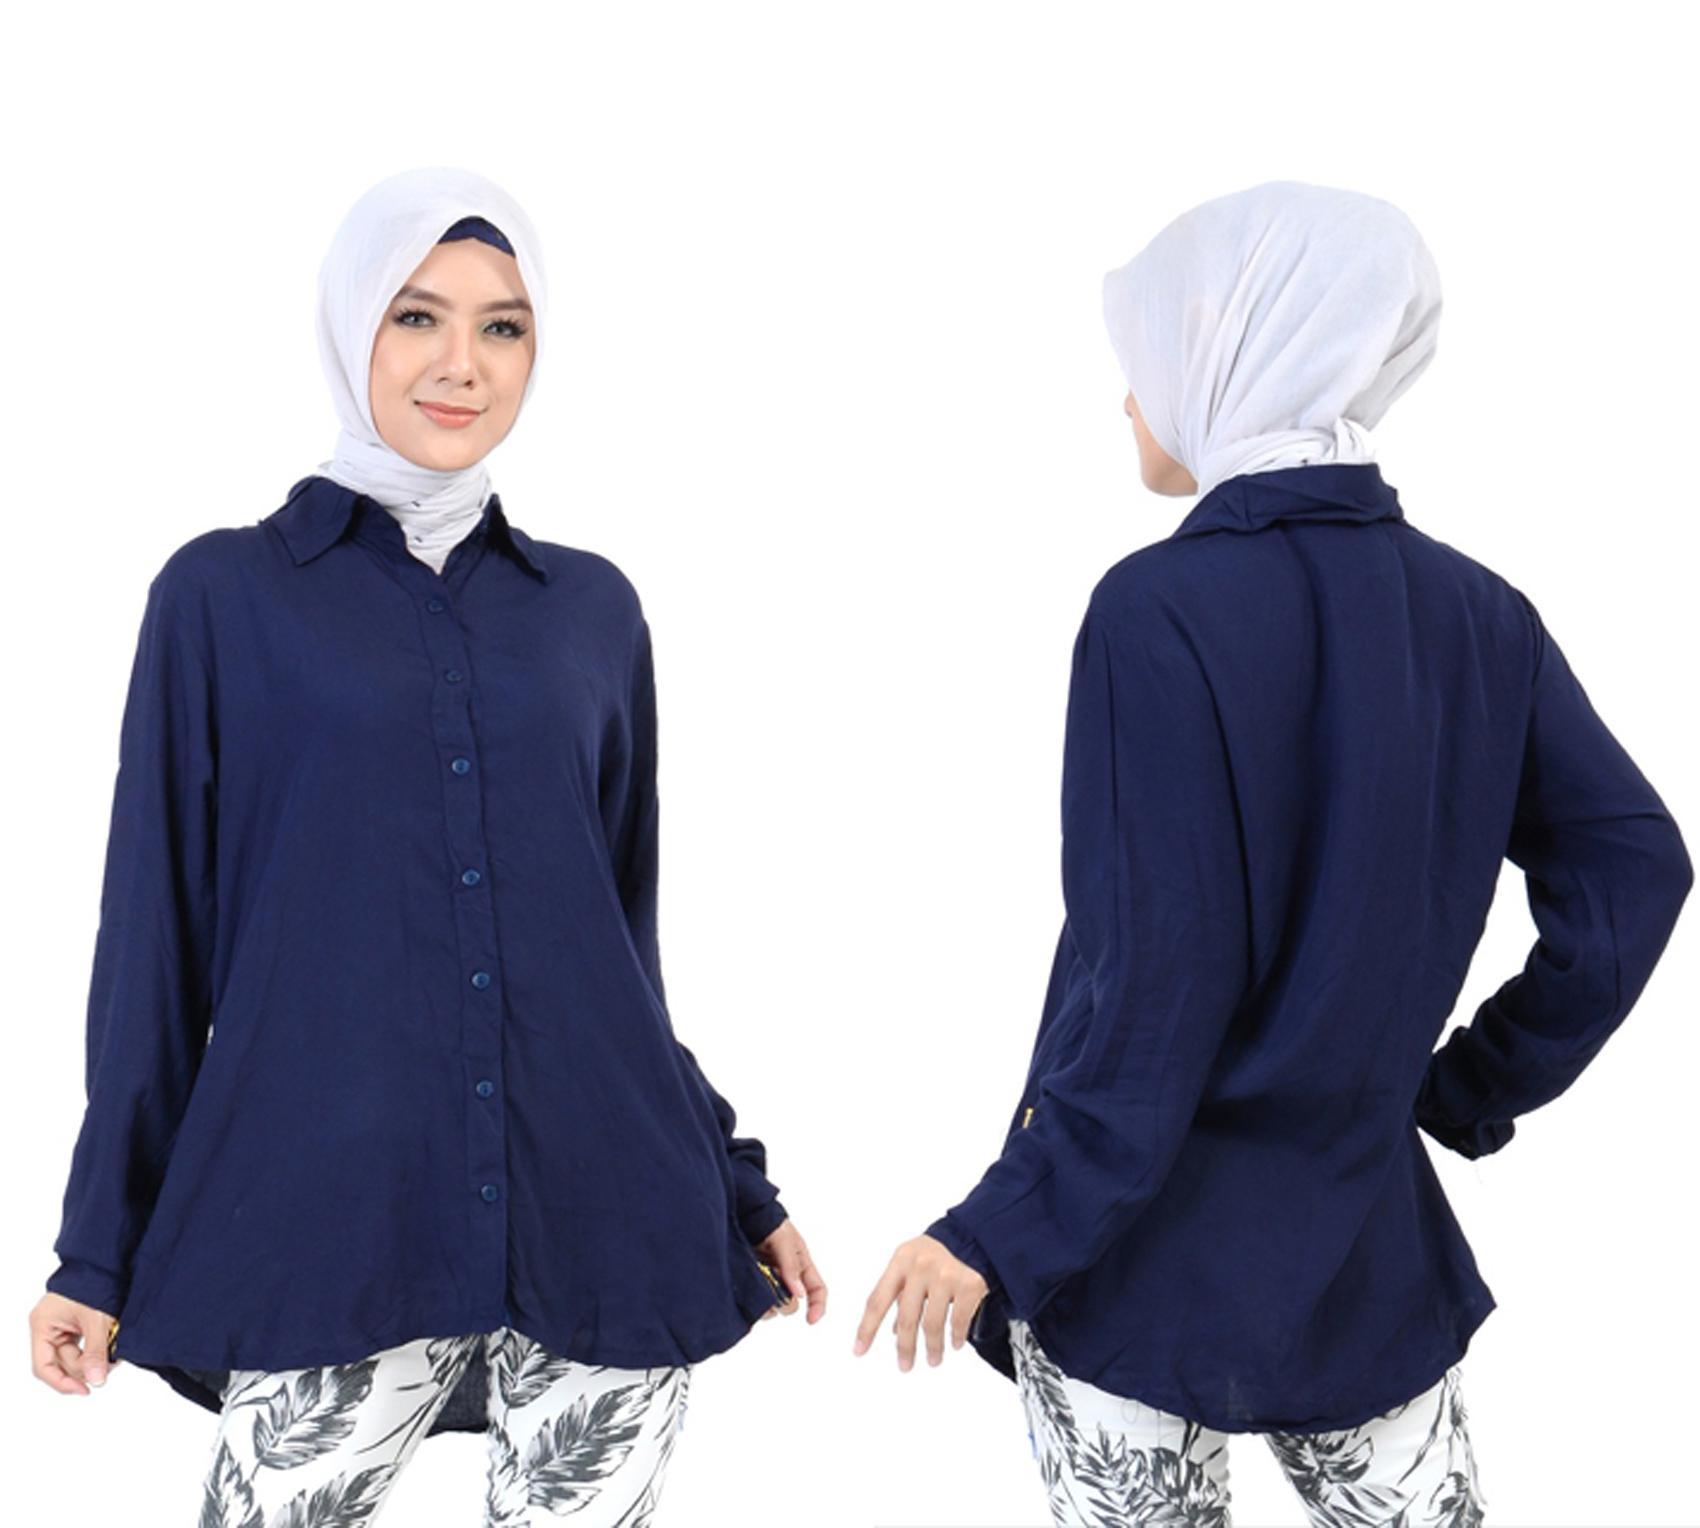 Jessica Fashion Long Hem Ginara / Tunik Wanita / Blus Wanita / Atasan Wanita / Baju Wanita / Long Hem / Flatshoes Wanita / Hijab / Hijab Fashion / Baju Tidur Wanita / Baju Panjang /Tas / Atasan Muslimah / Kerudung / Kemeja Wanita / BEST SELLER